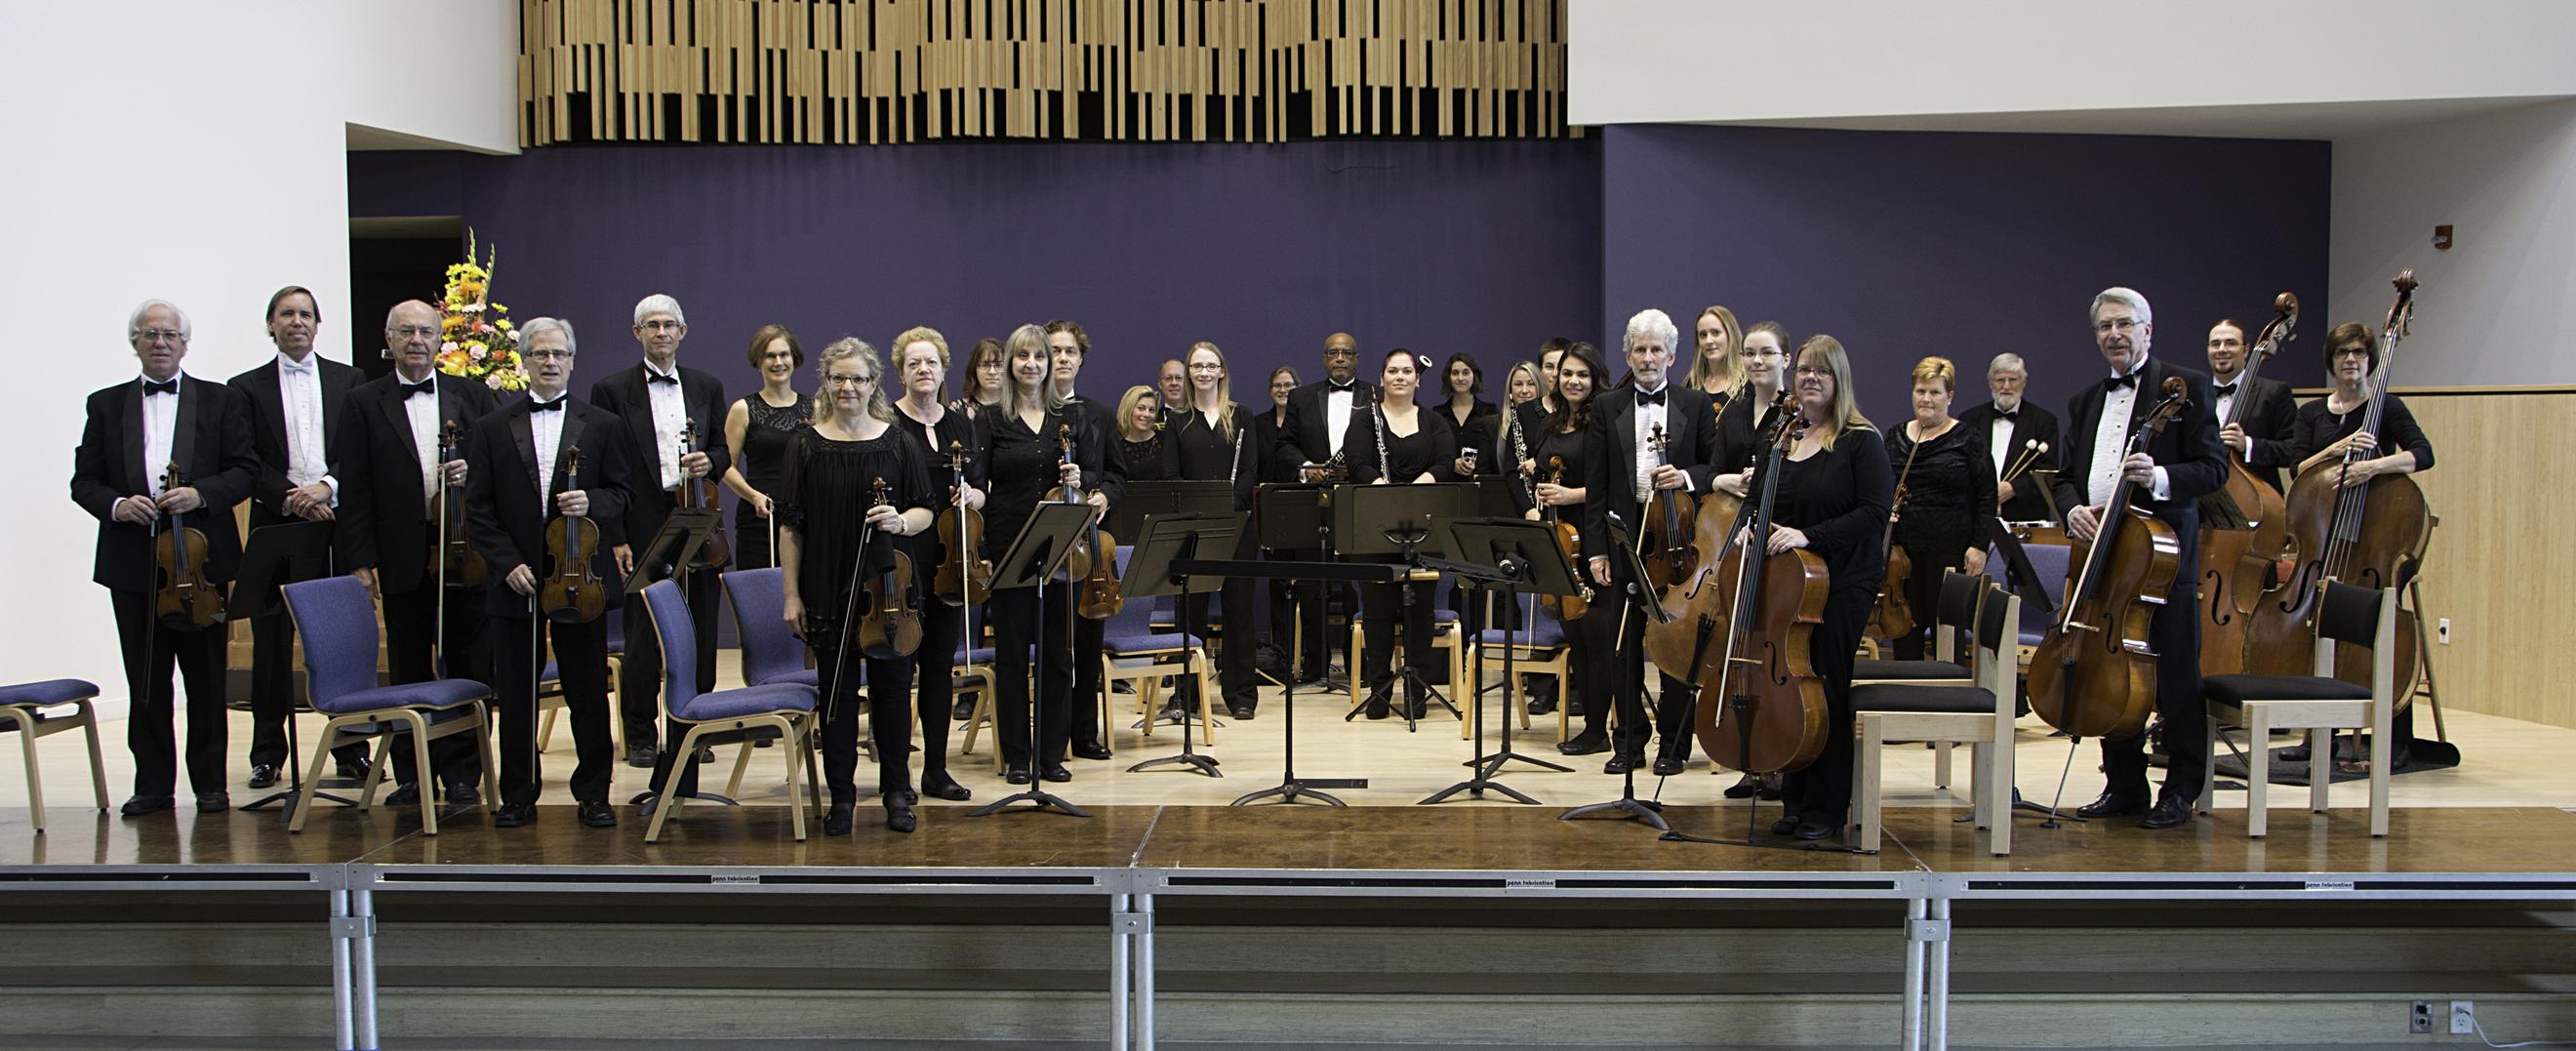 Kitchener Waterloo Chamber Orchestra